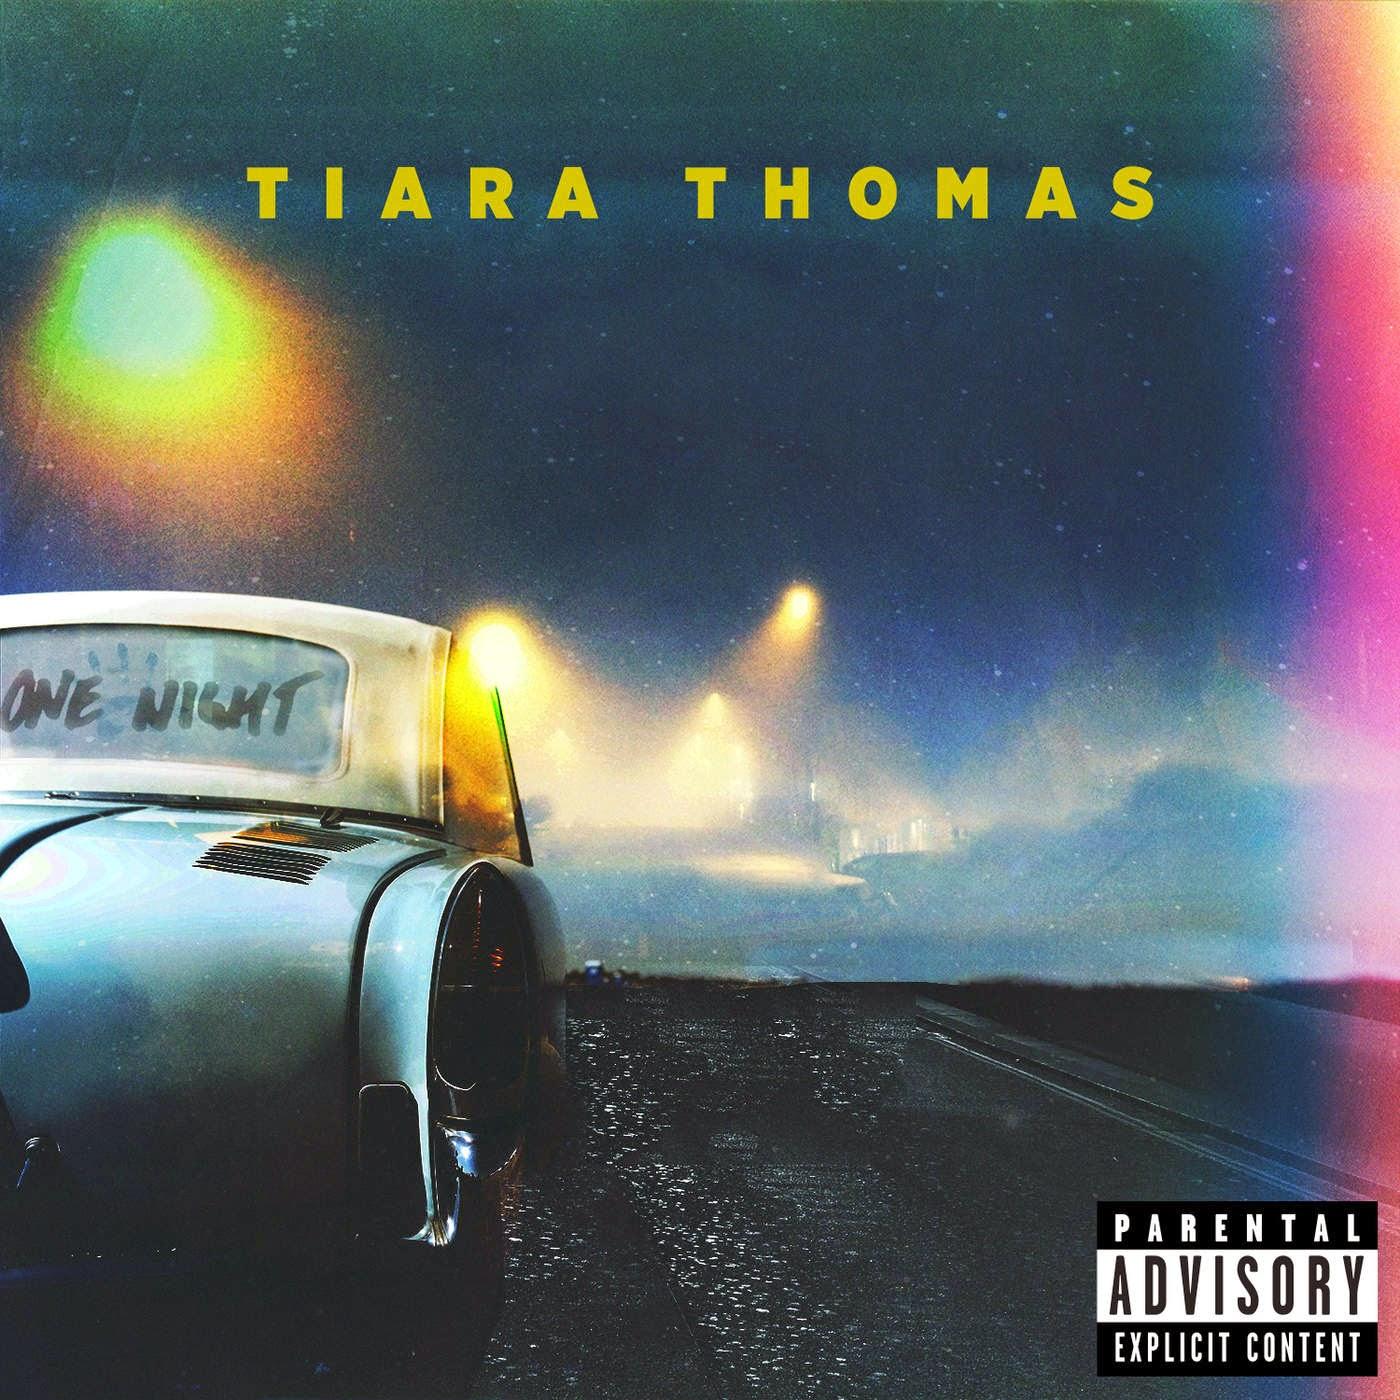 Tiara Thomas - One Night - Single Cover